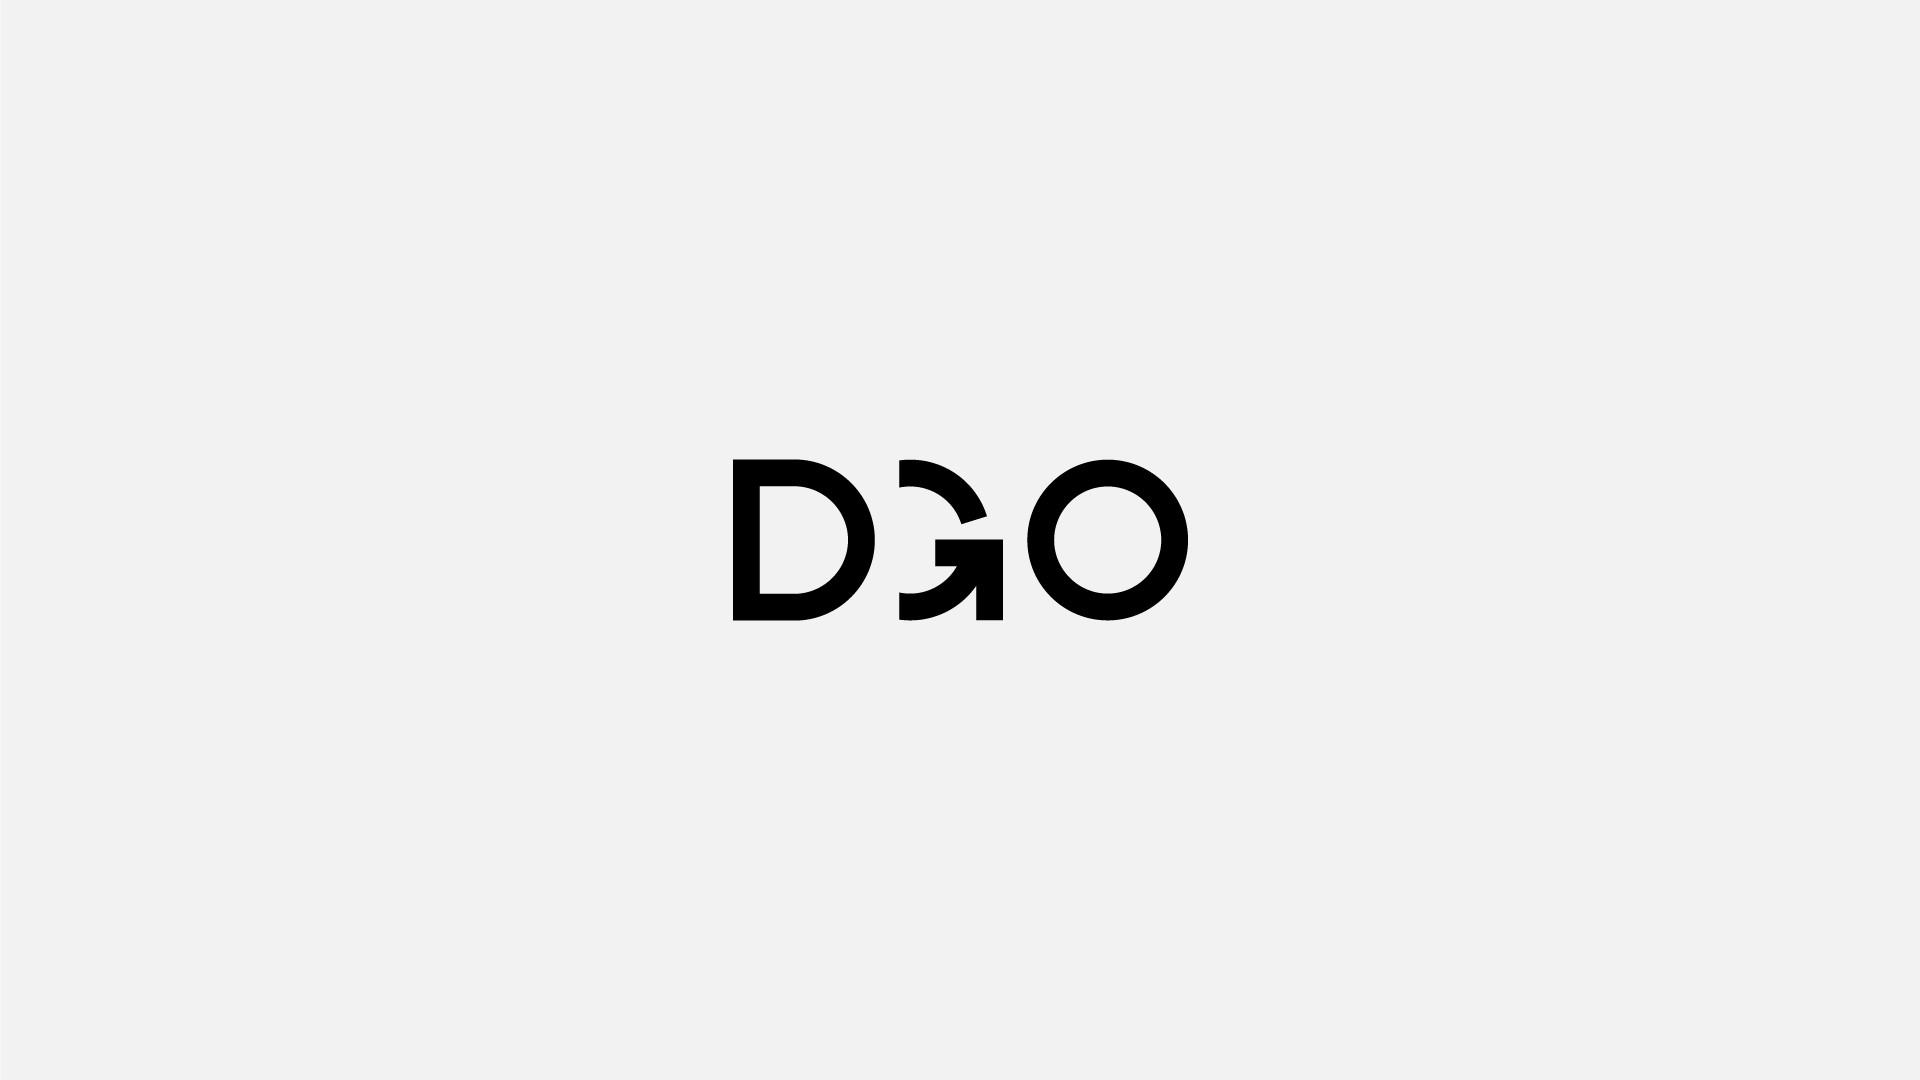 DGO_03.jpg